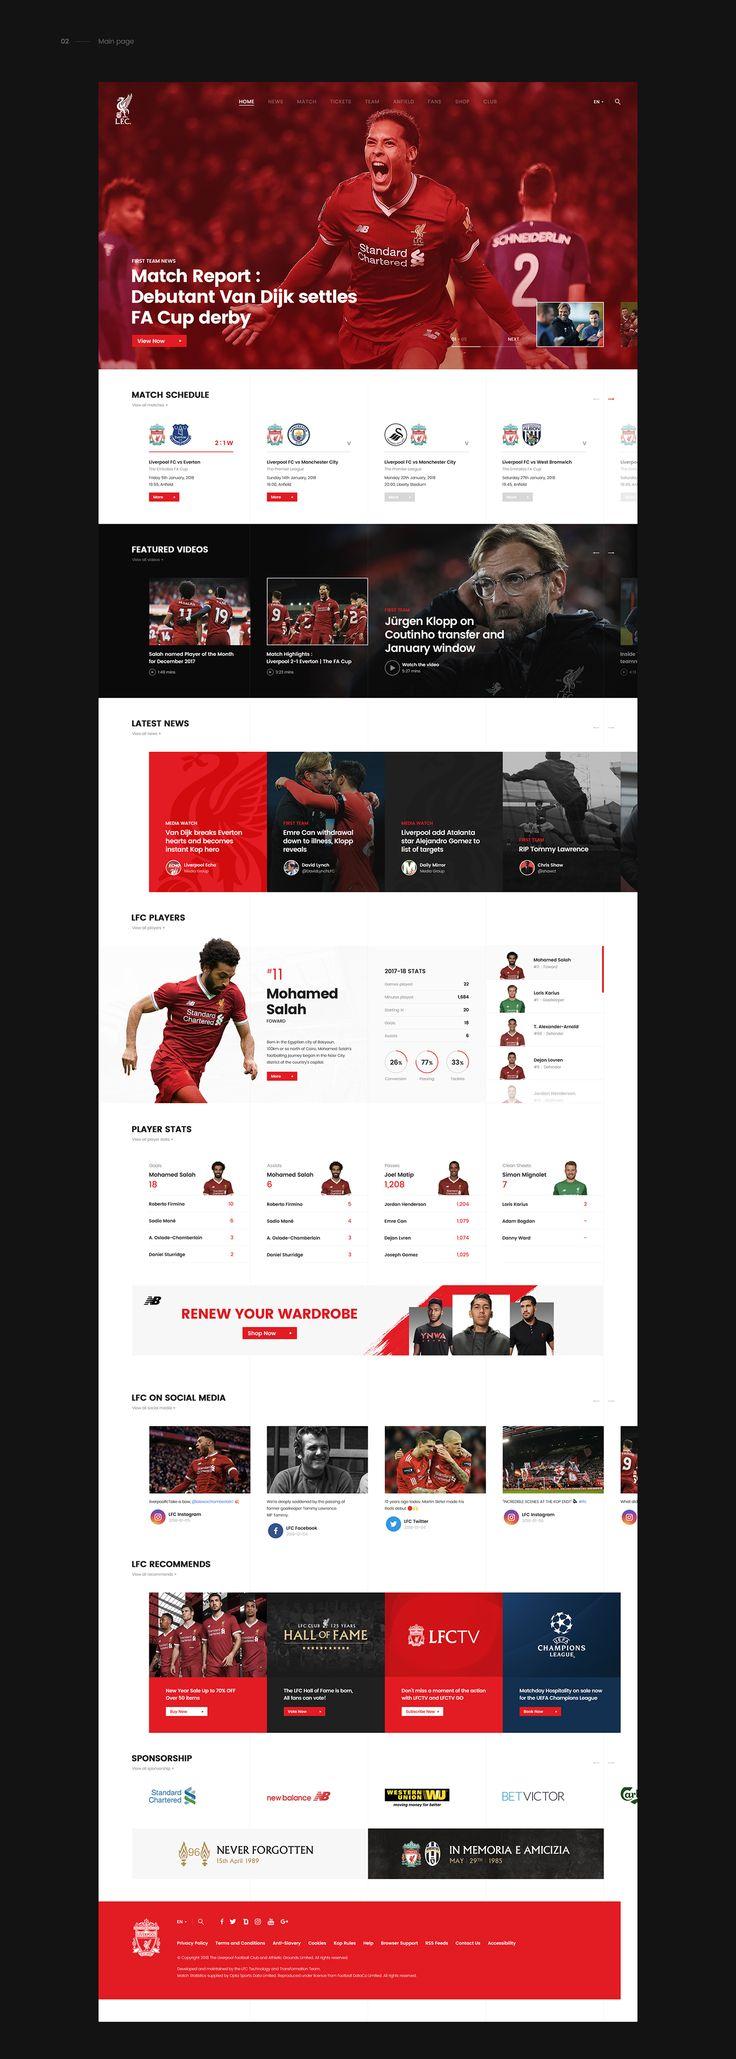 Liverpool FC Website Design Concept on Behance